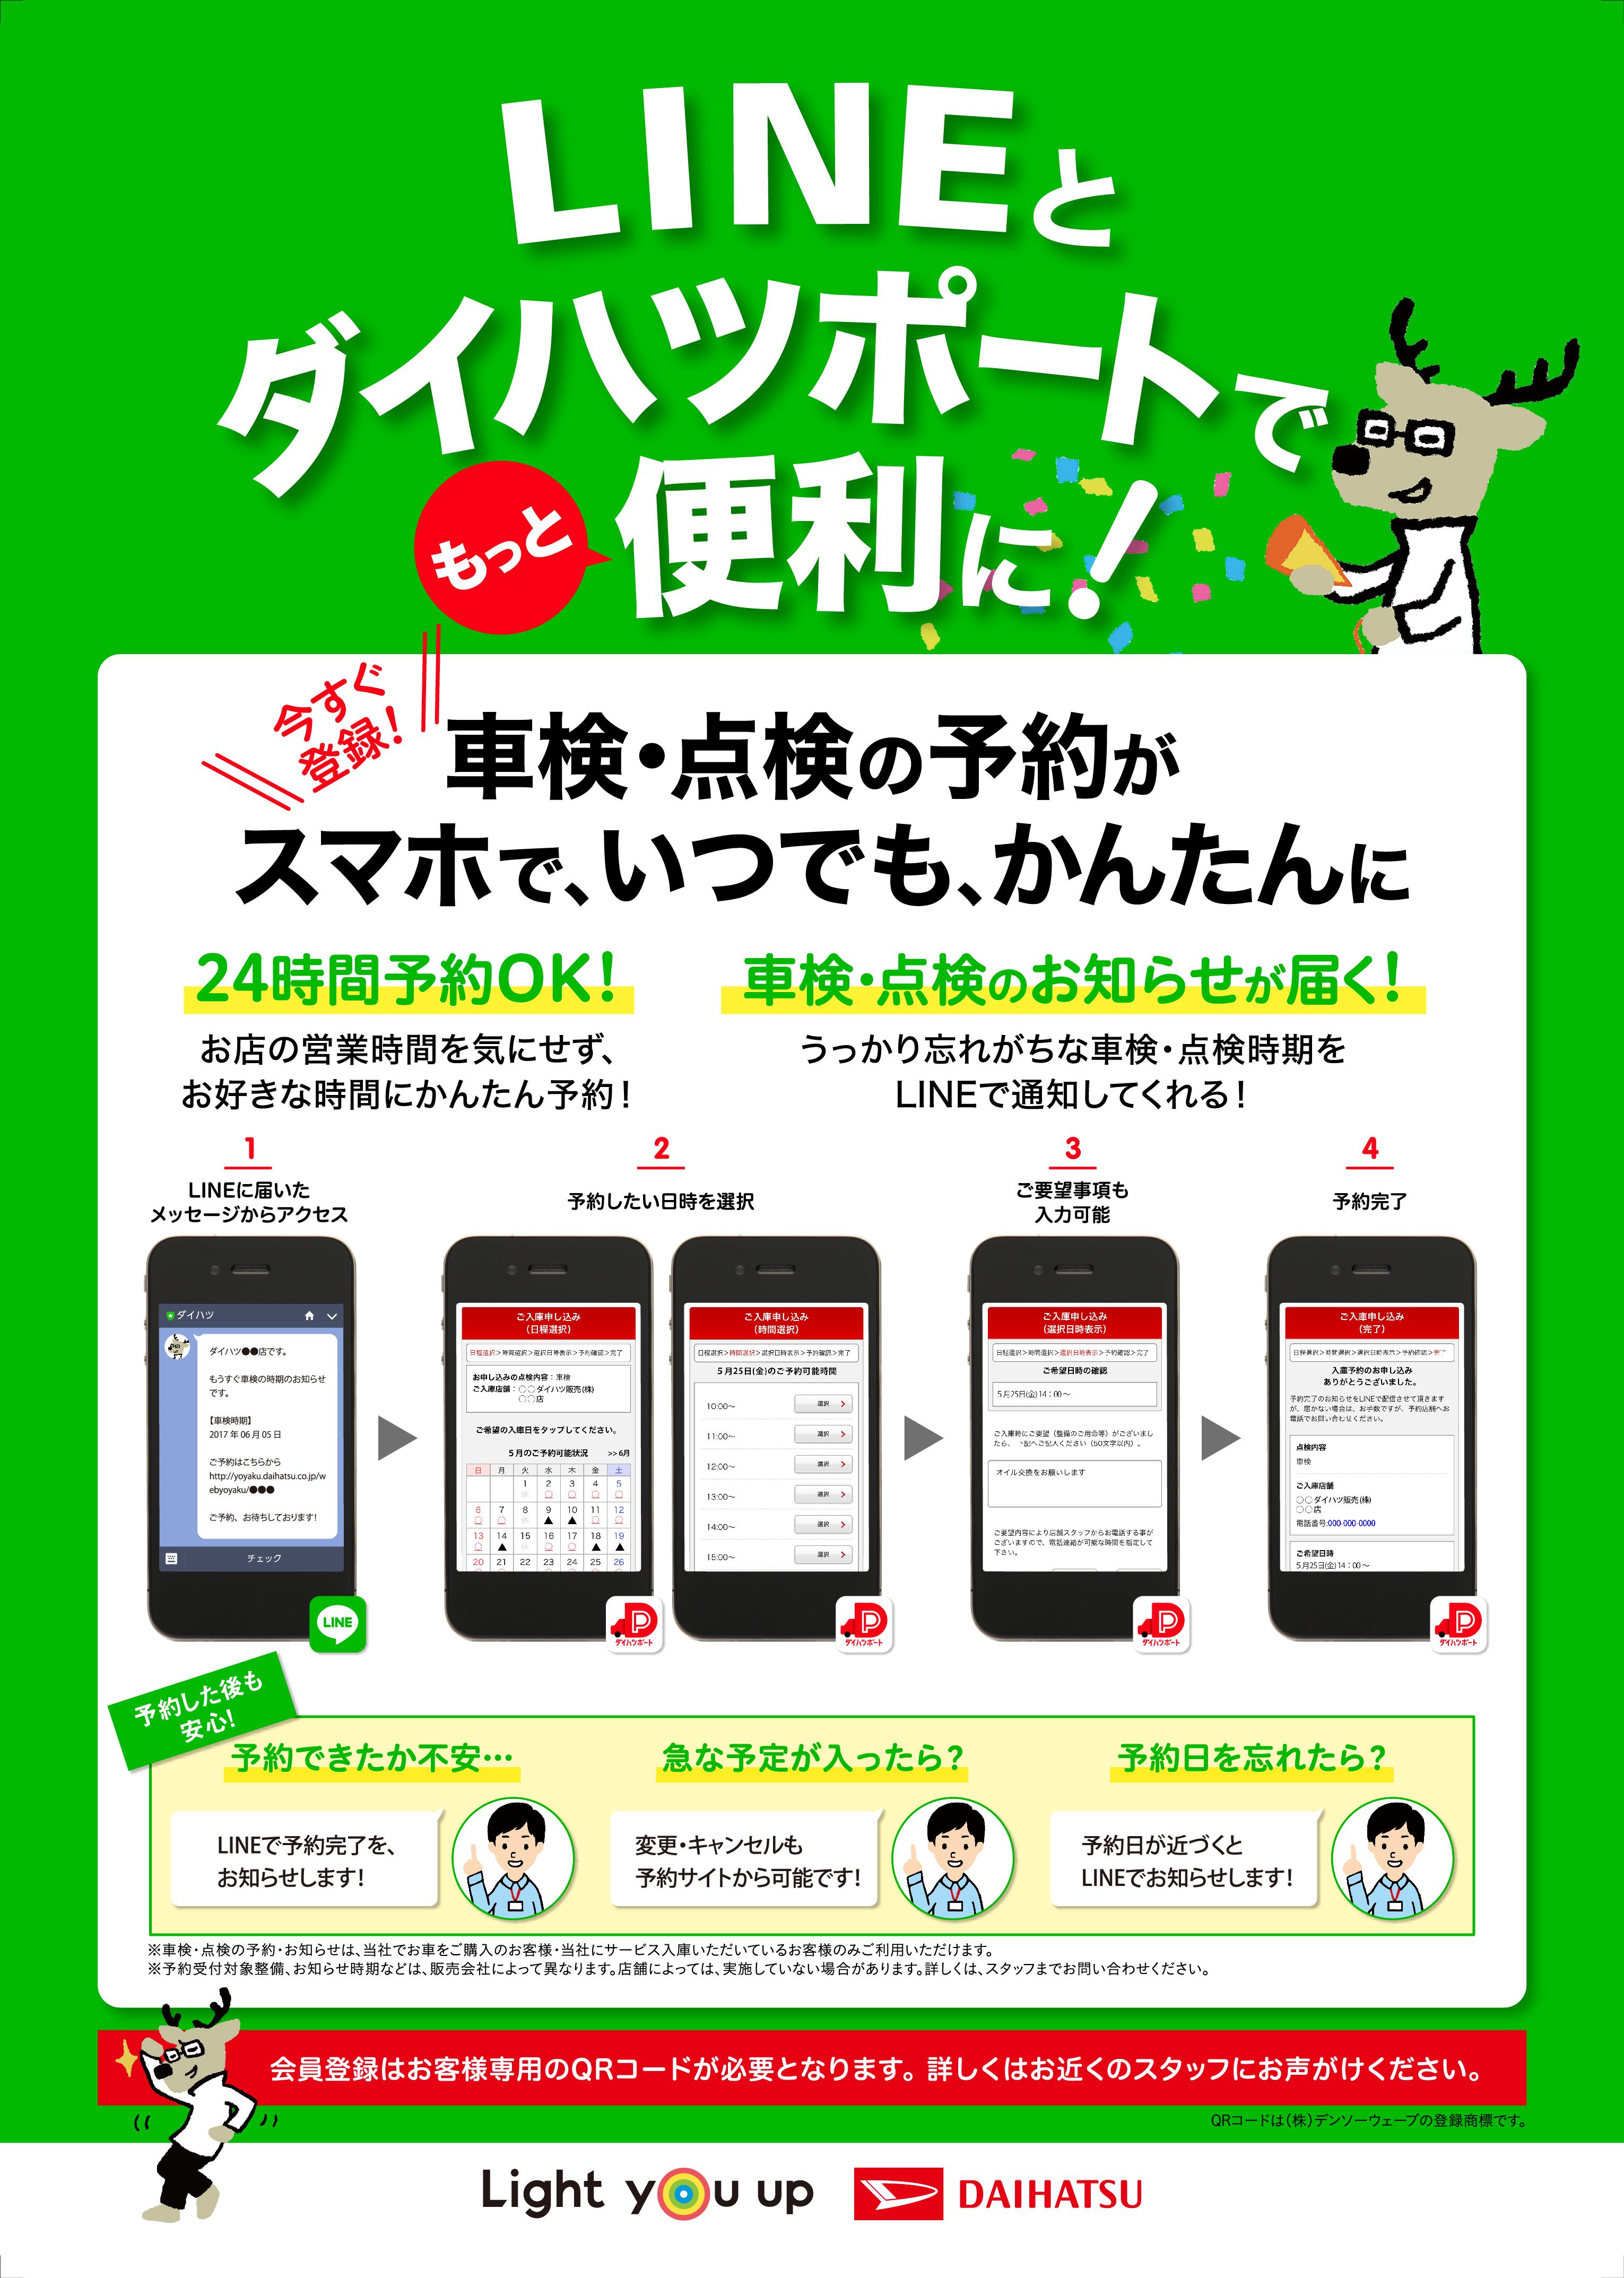 LINE☆車検・点検Web予約スタート! | 滋賀ダイハツ販売株式会社 ...